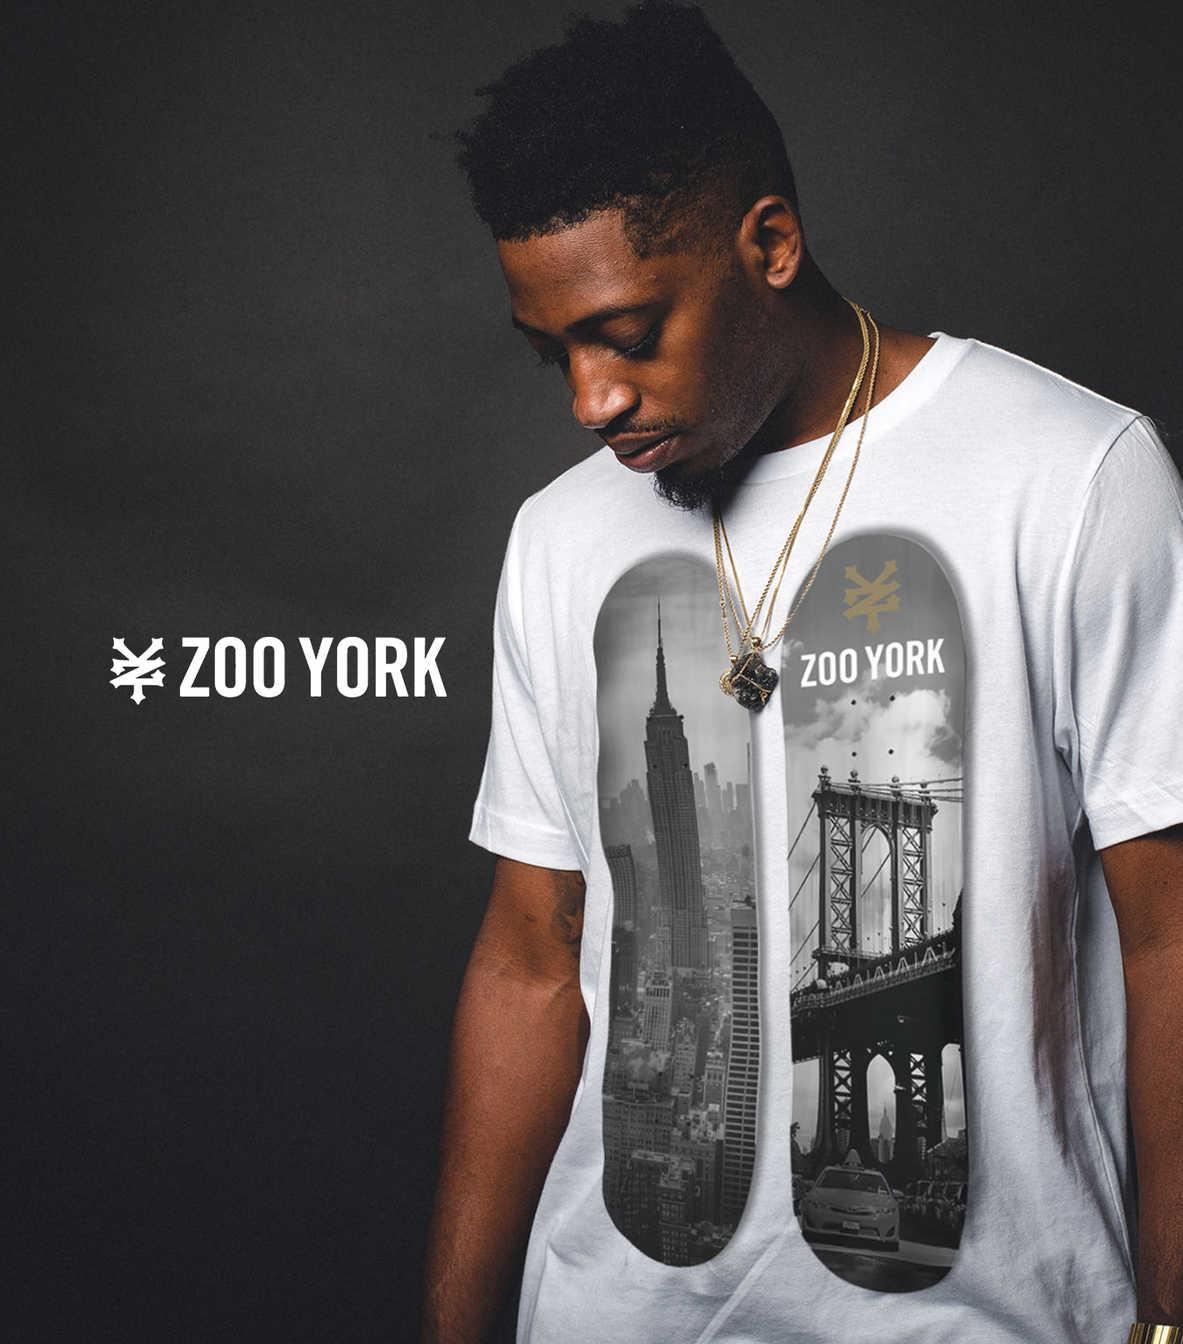 vente privee zoo